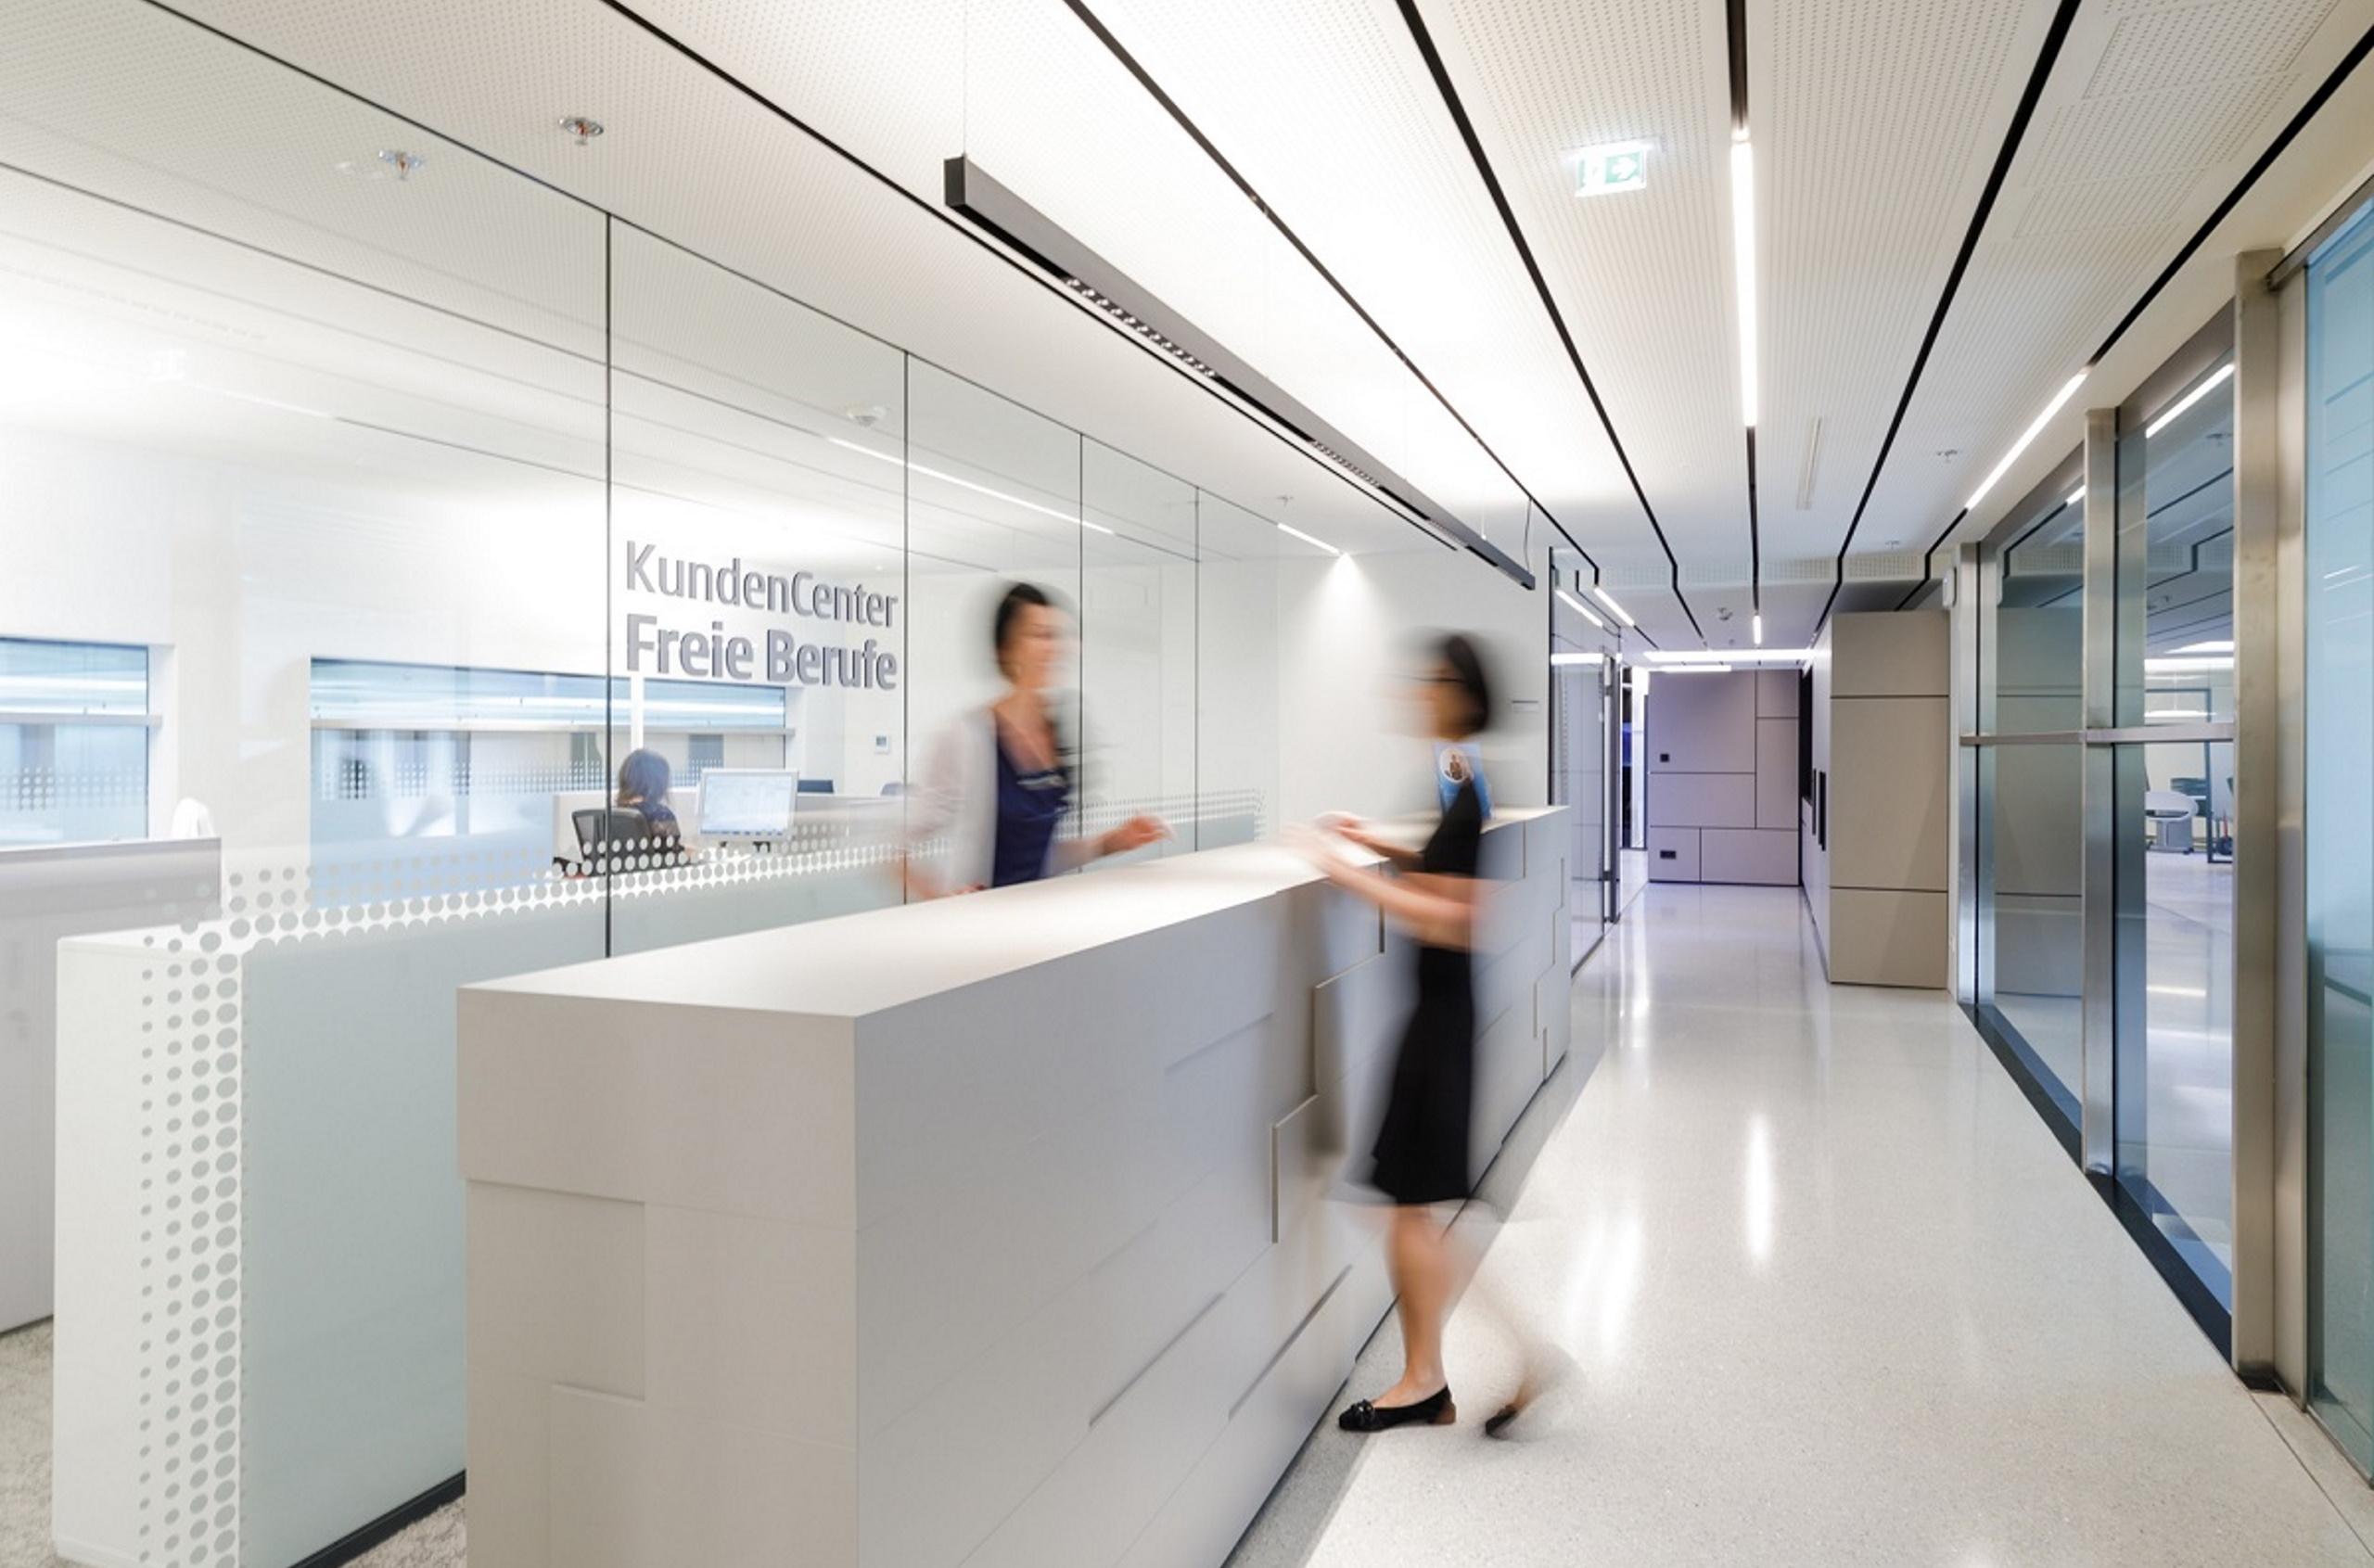 Tiroler Sparkasse   KundenCenter Freie Berufe   MASThave